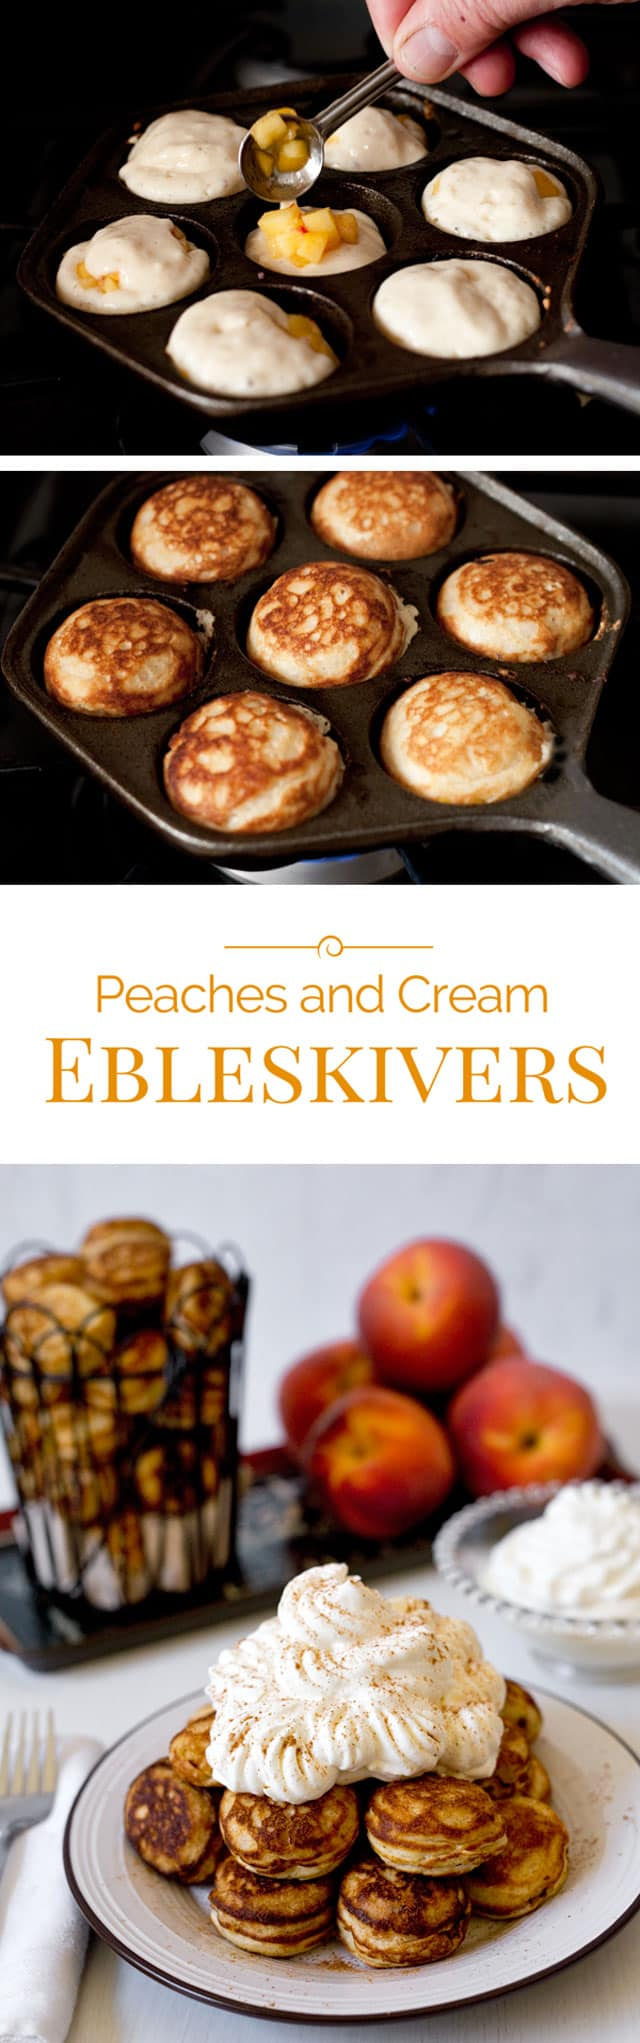 /Peaches-and-Cream-Ebleskivers-Collage-2